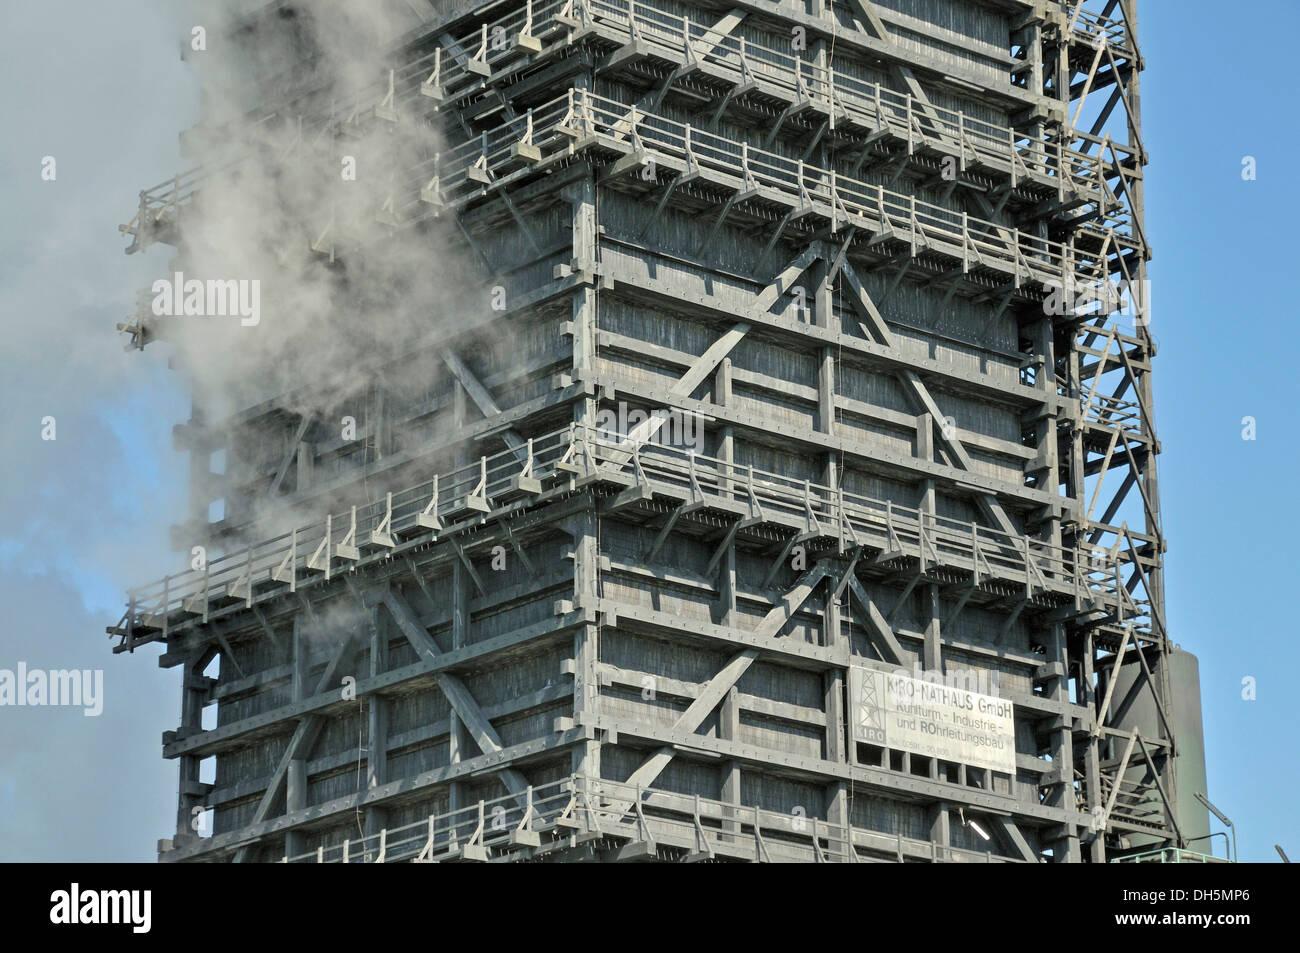 Torre de enfriamiento húmedo sur, proyecto Kokerei Schwelgern, planta de coquización, ThyssenKrupp Steel Works en Hamborn, Duisburg Imagen De Stock